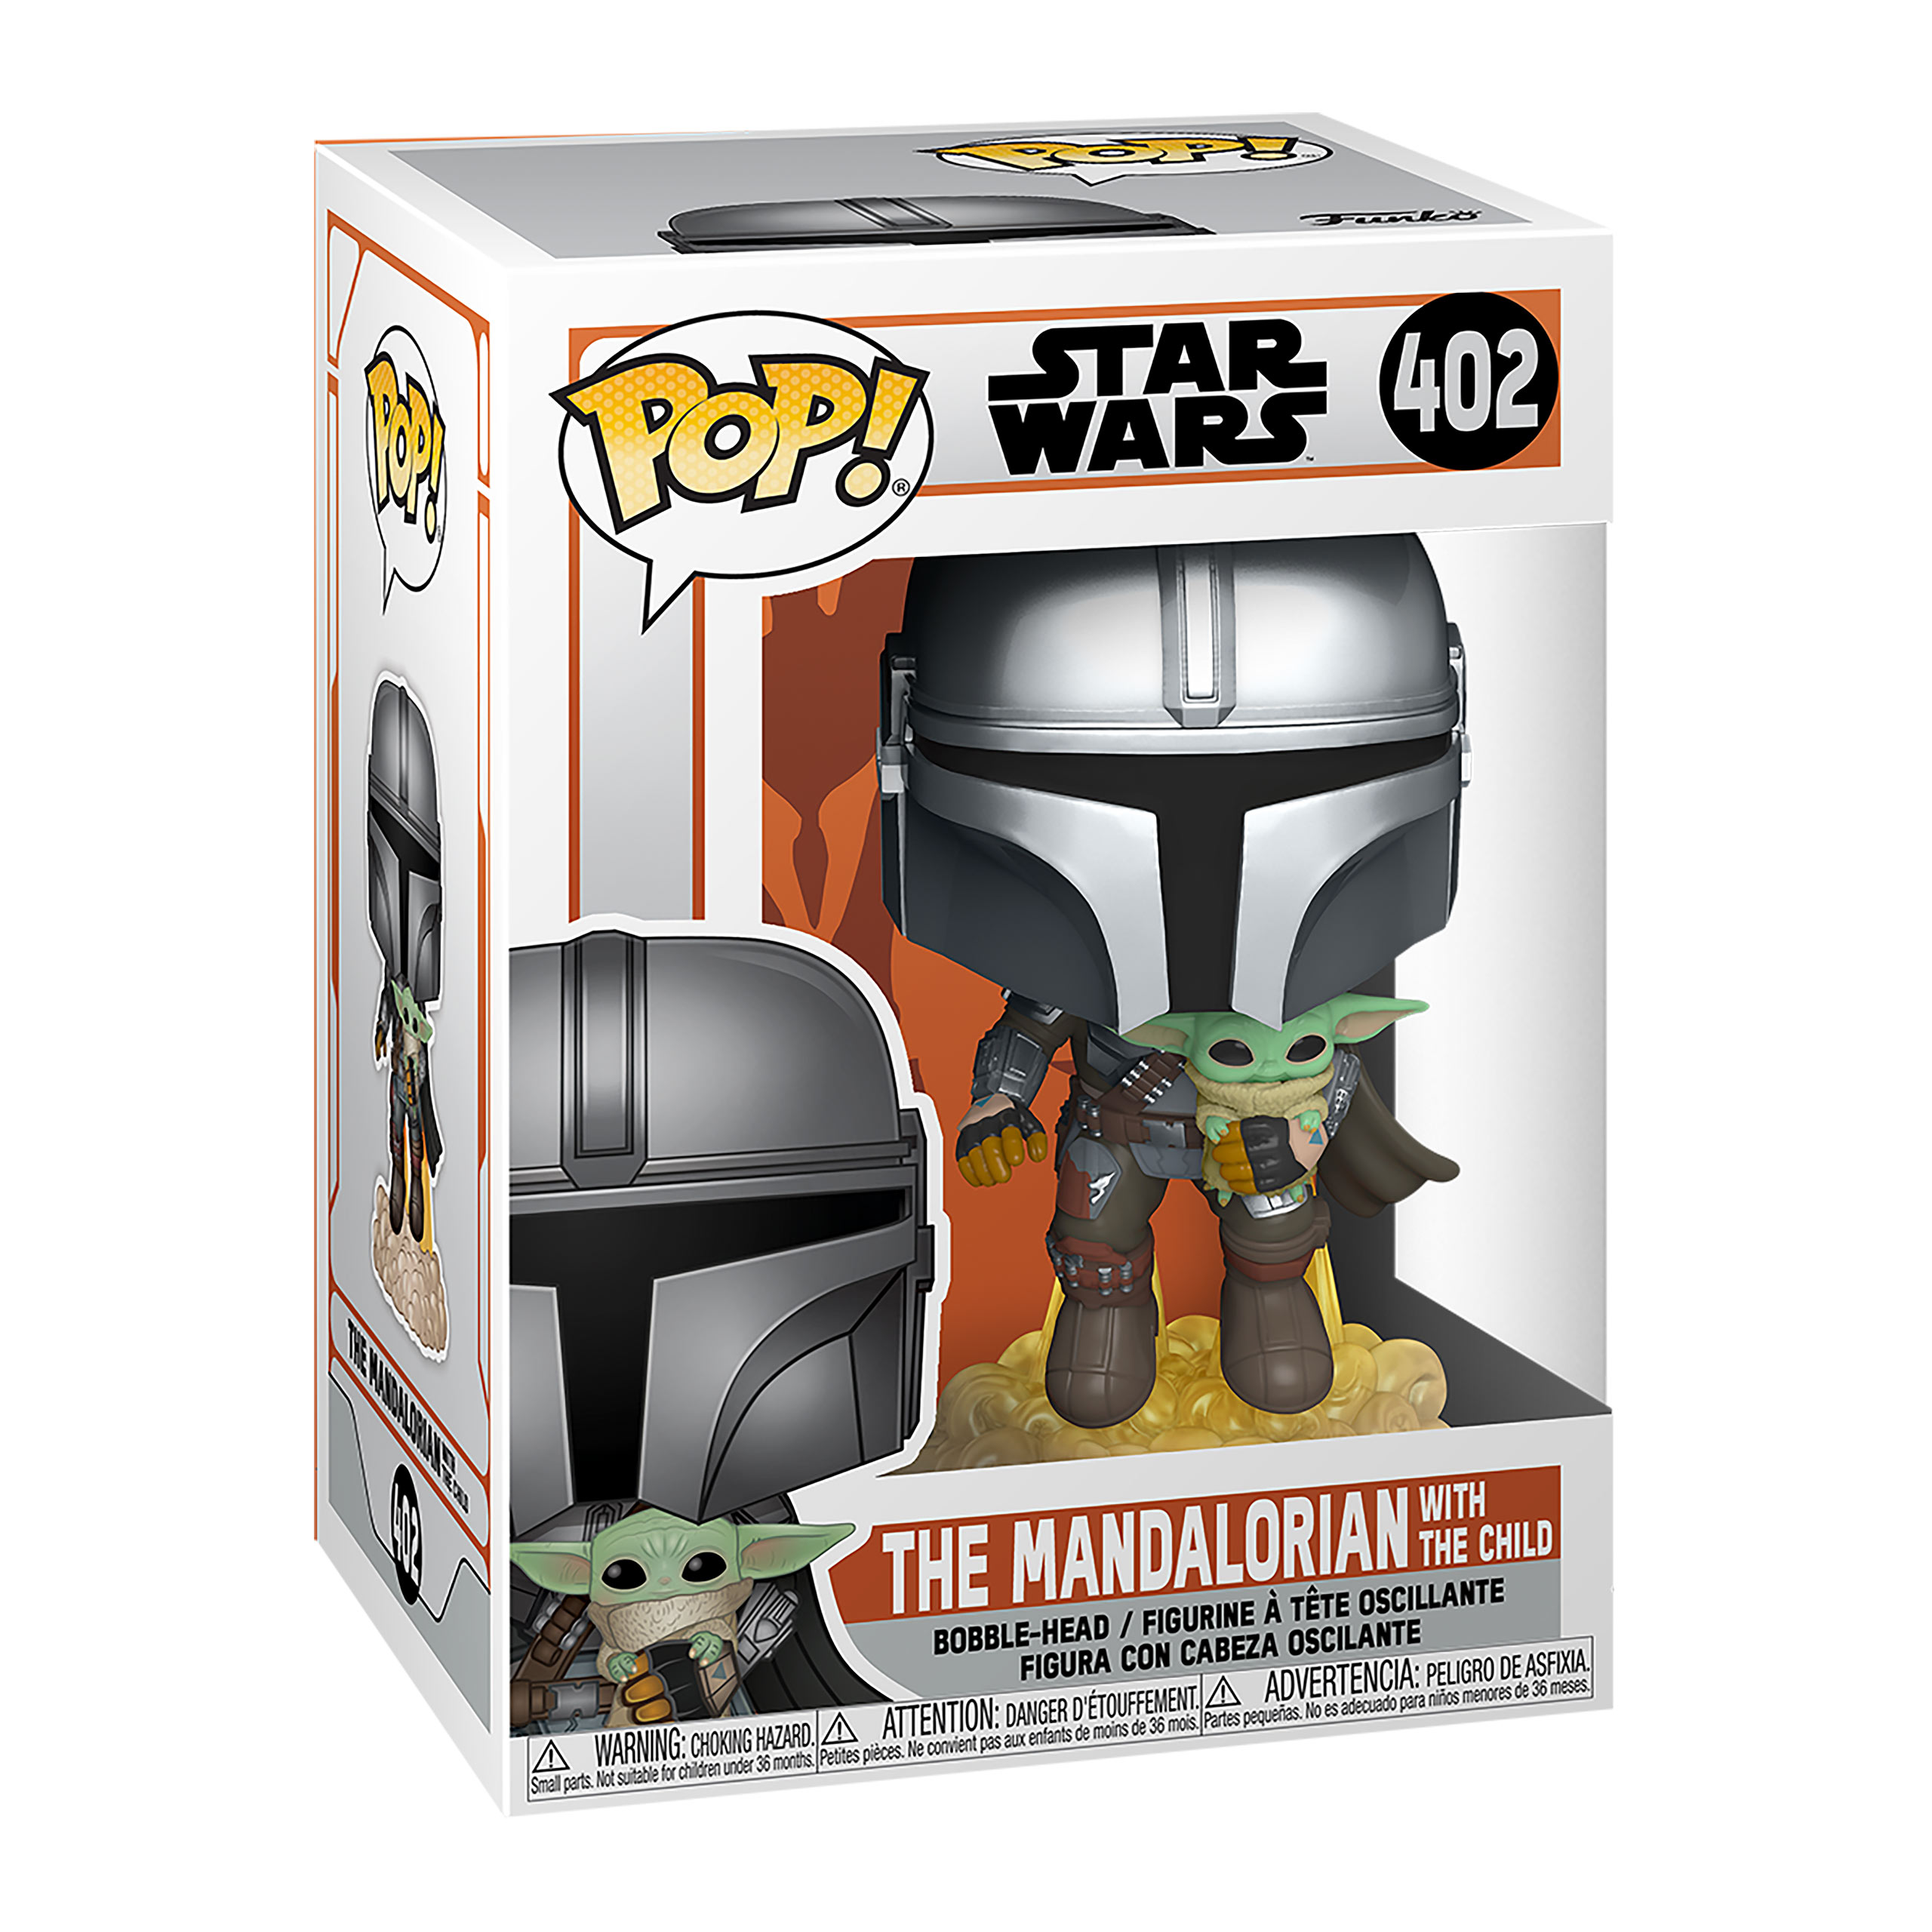 The Mandalorian mit The Child Funko Pop Wackelkopf-Figur - Star Wars